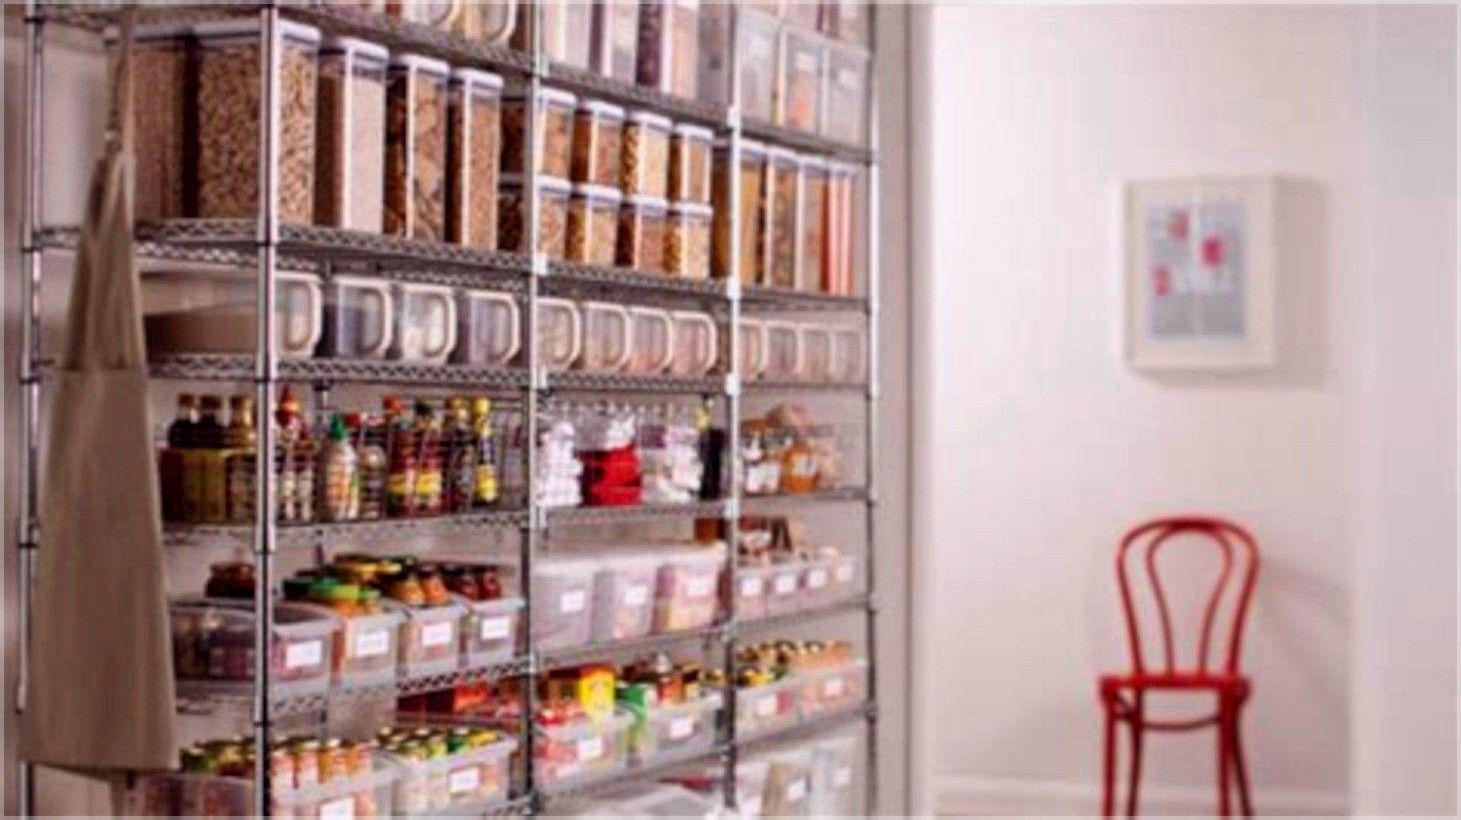 small kitchen storage ideas pinterest, quirky kitchen ... on drawers kitchen countertop, pantries for kitchen storage ideas, building kitchen cabinet ideas, kitchen organization ideas, drawer organizer ideas,